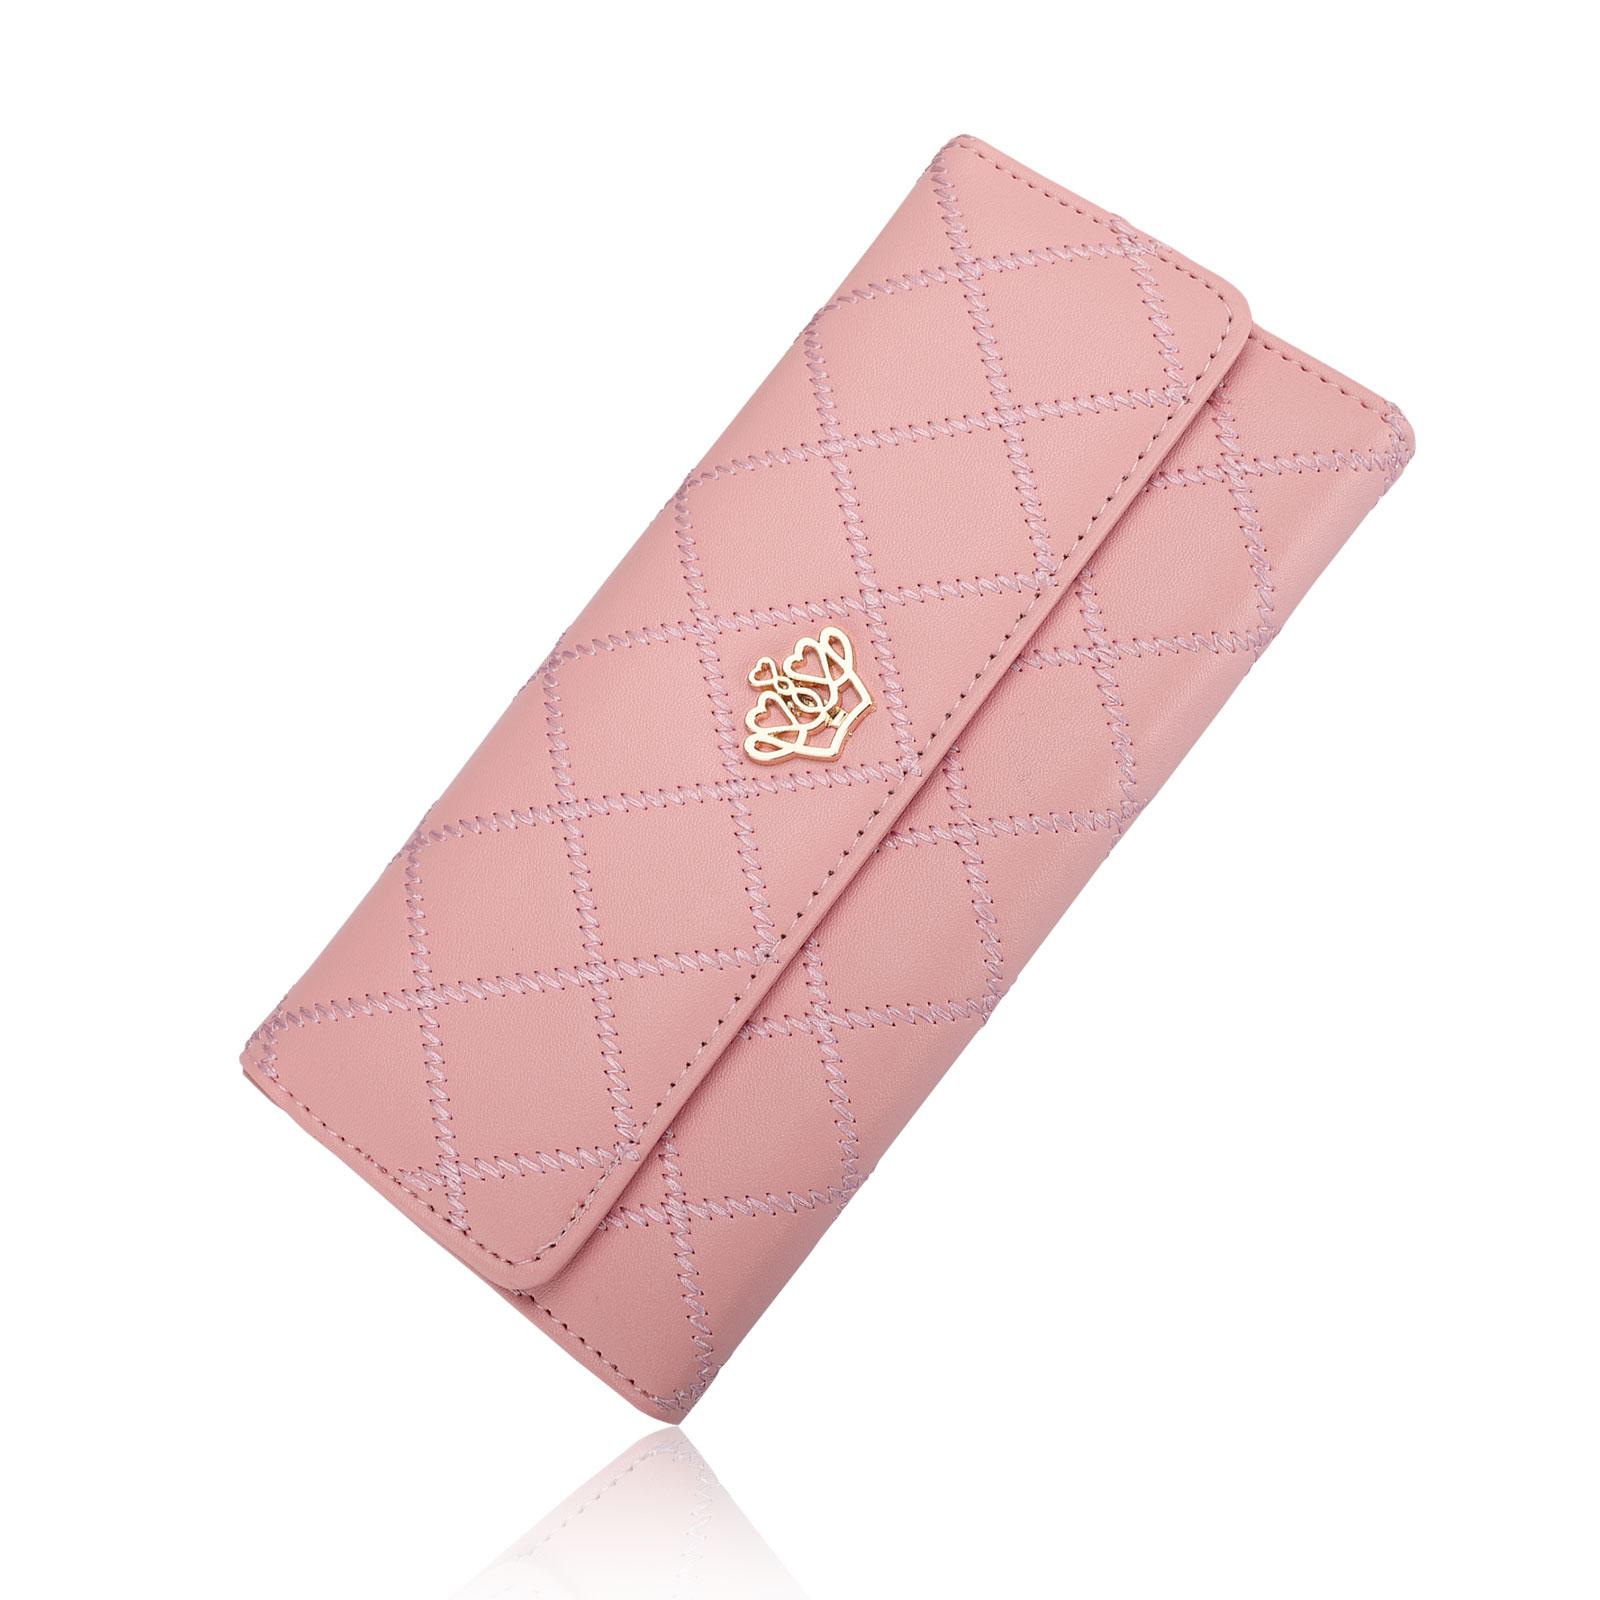 Women-Fashion-Bifold-Wallet-Leather-Clutch-Card-Holder-Purse-Lady-Long-Handbag thumbnail 11